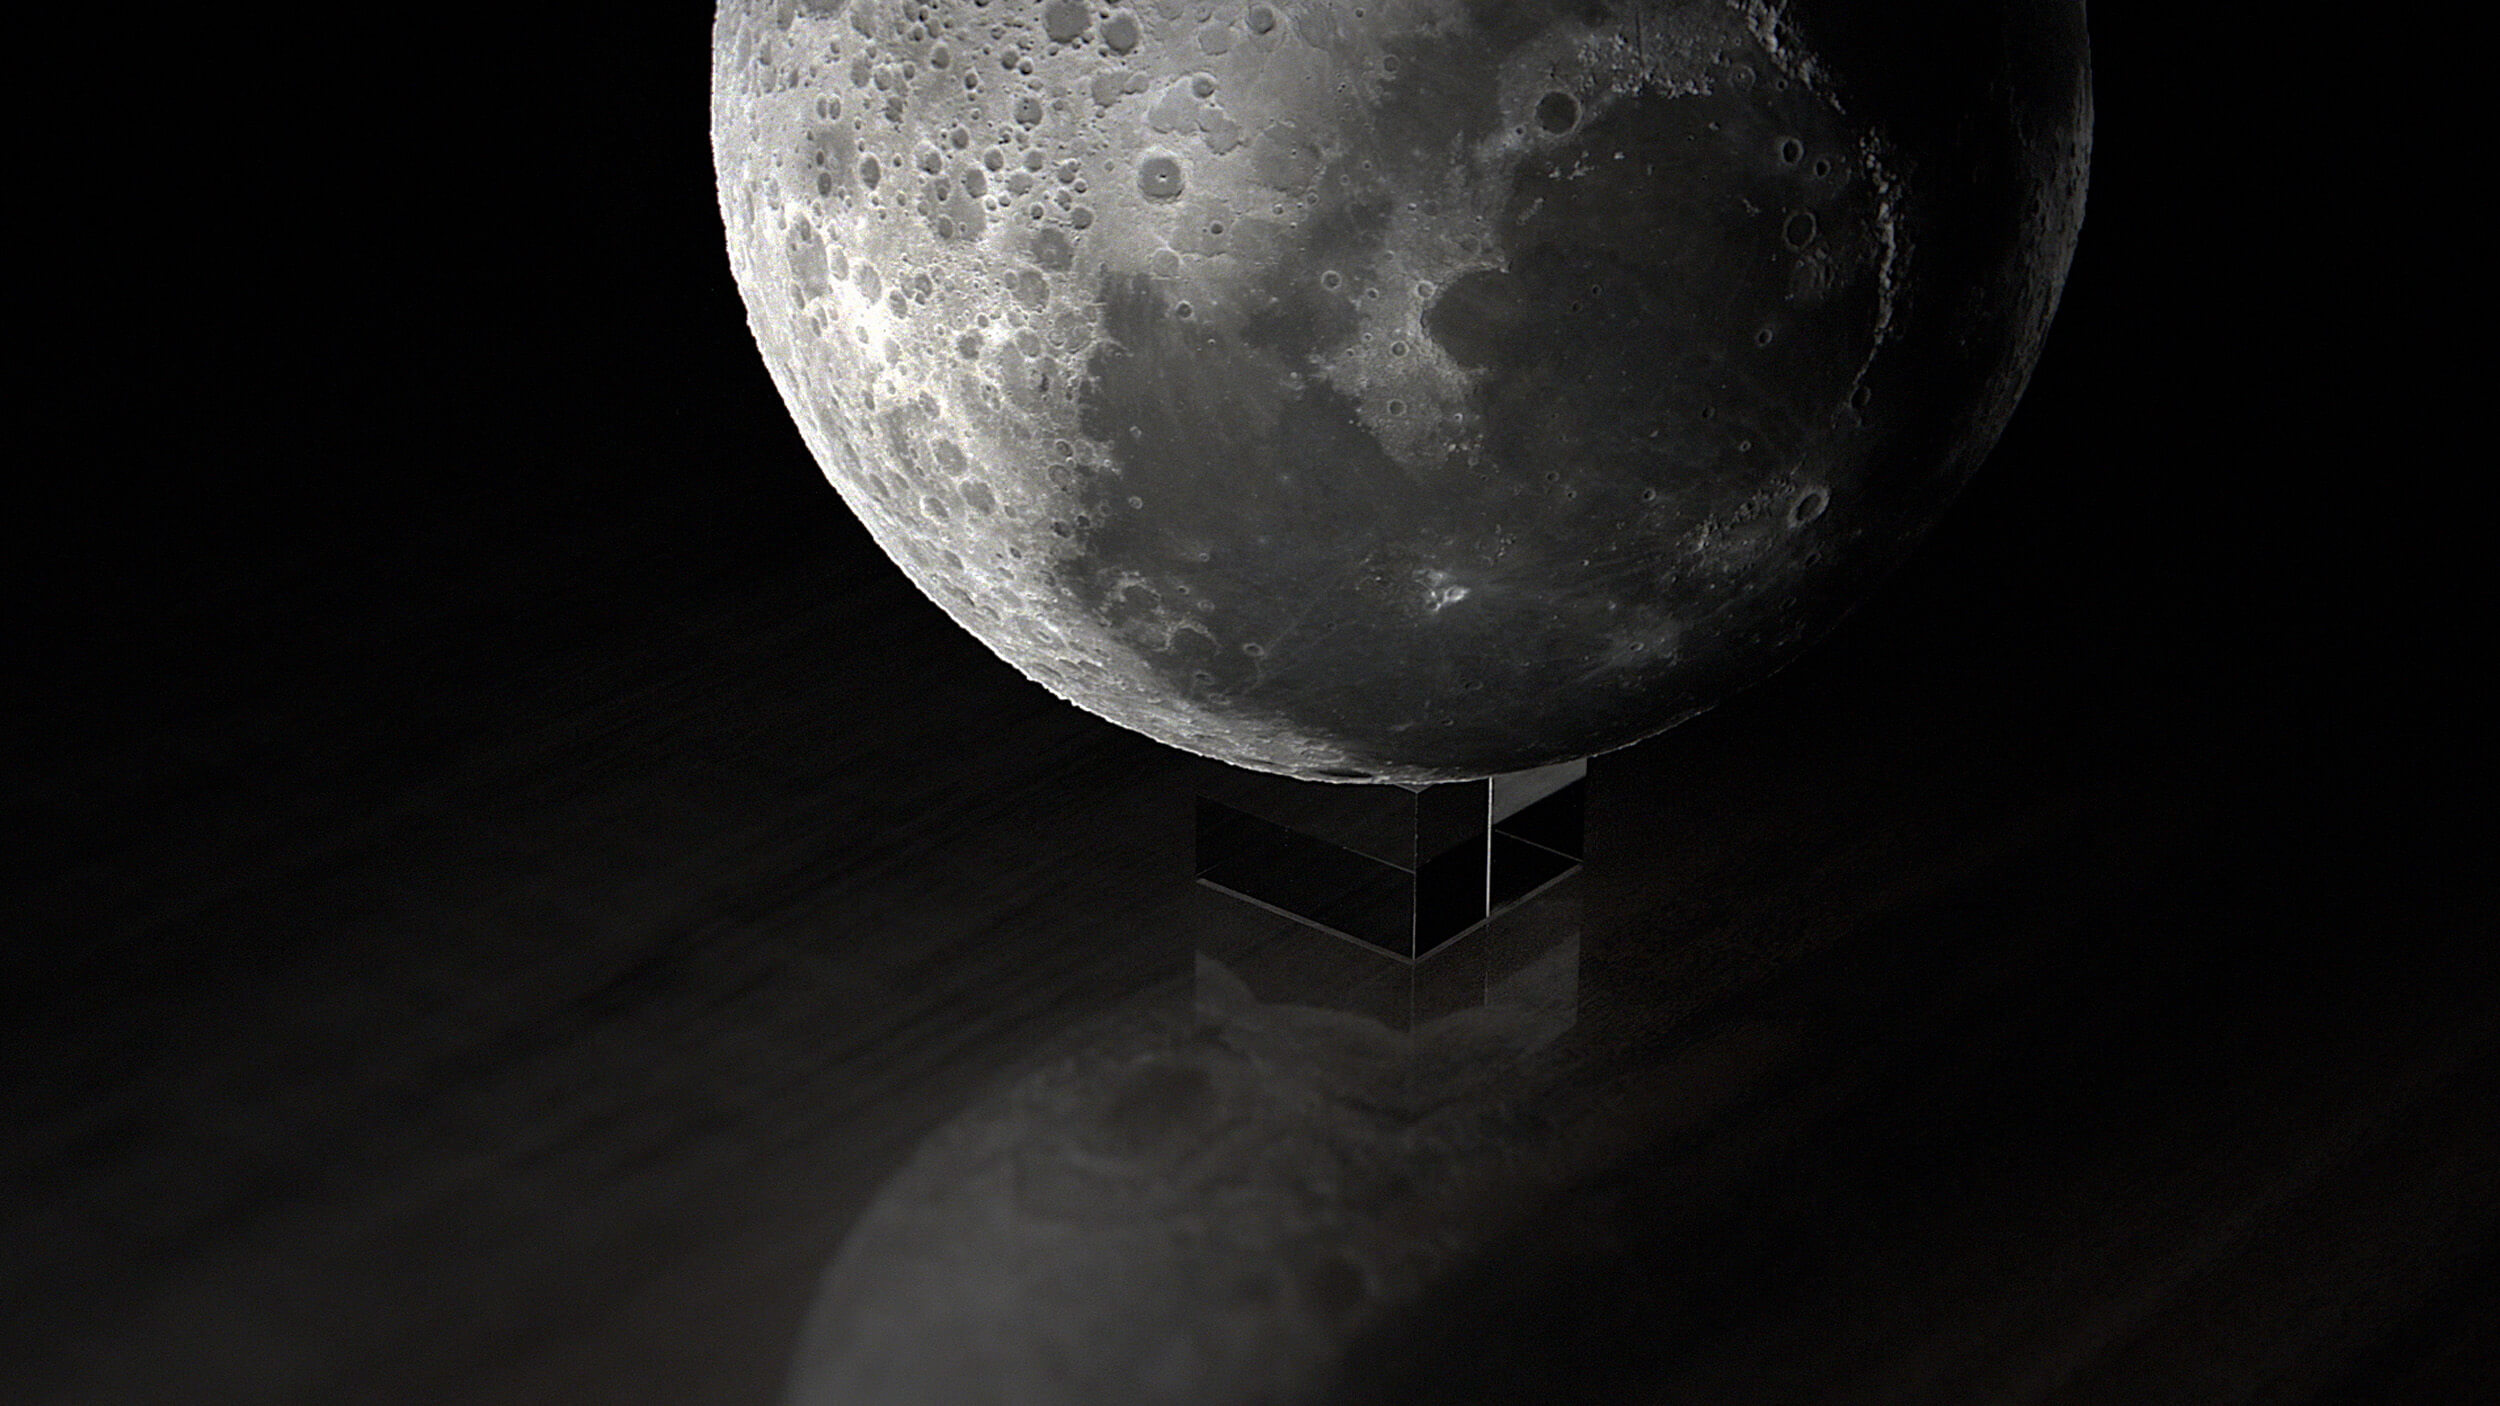 lunar-006_20170711185455.jpg